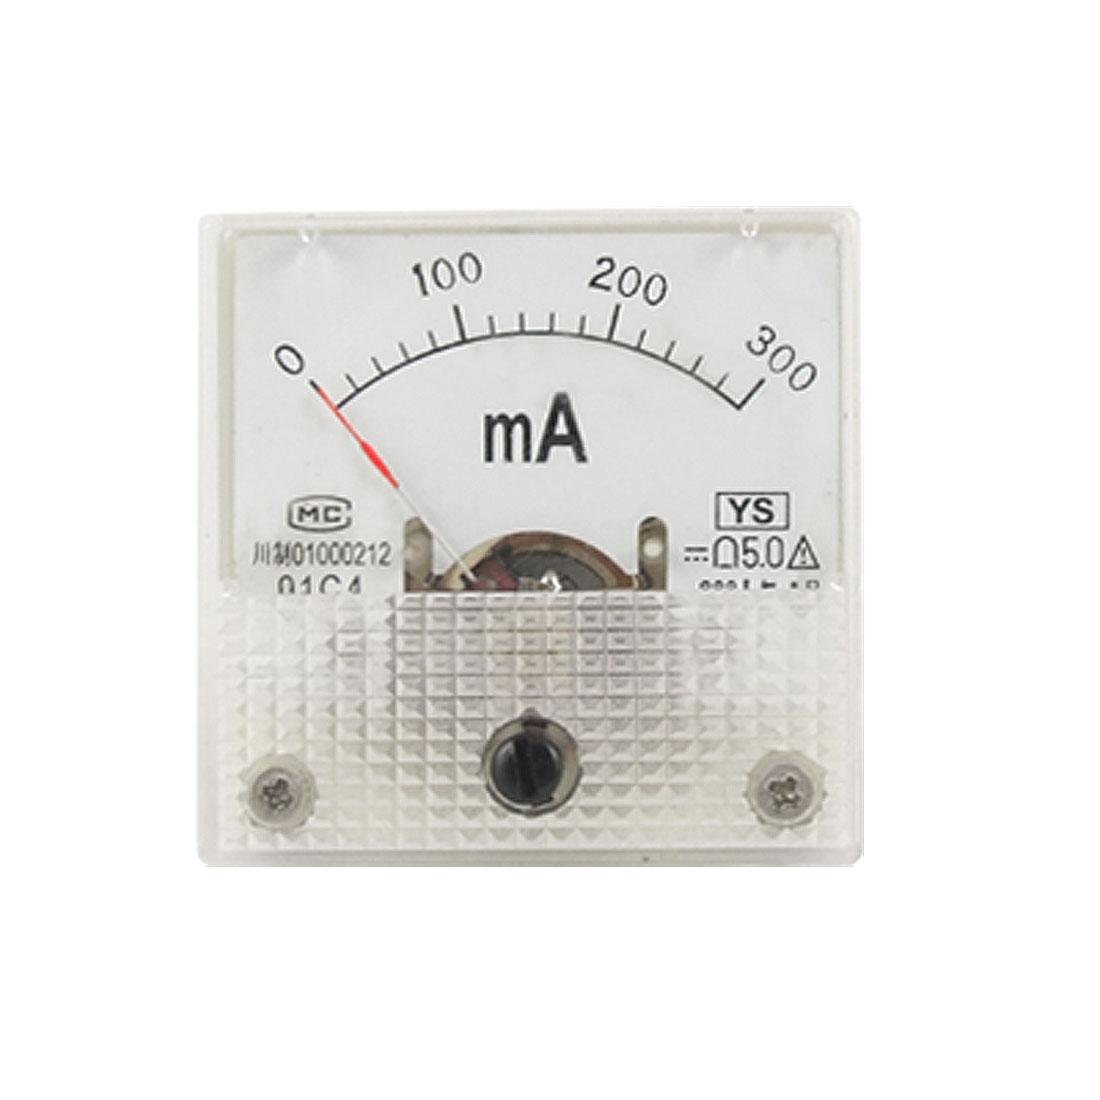 Measuring DC 0-300mA Analog Current Meter Ammeter 91C4